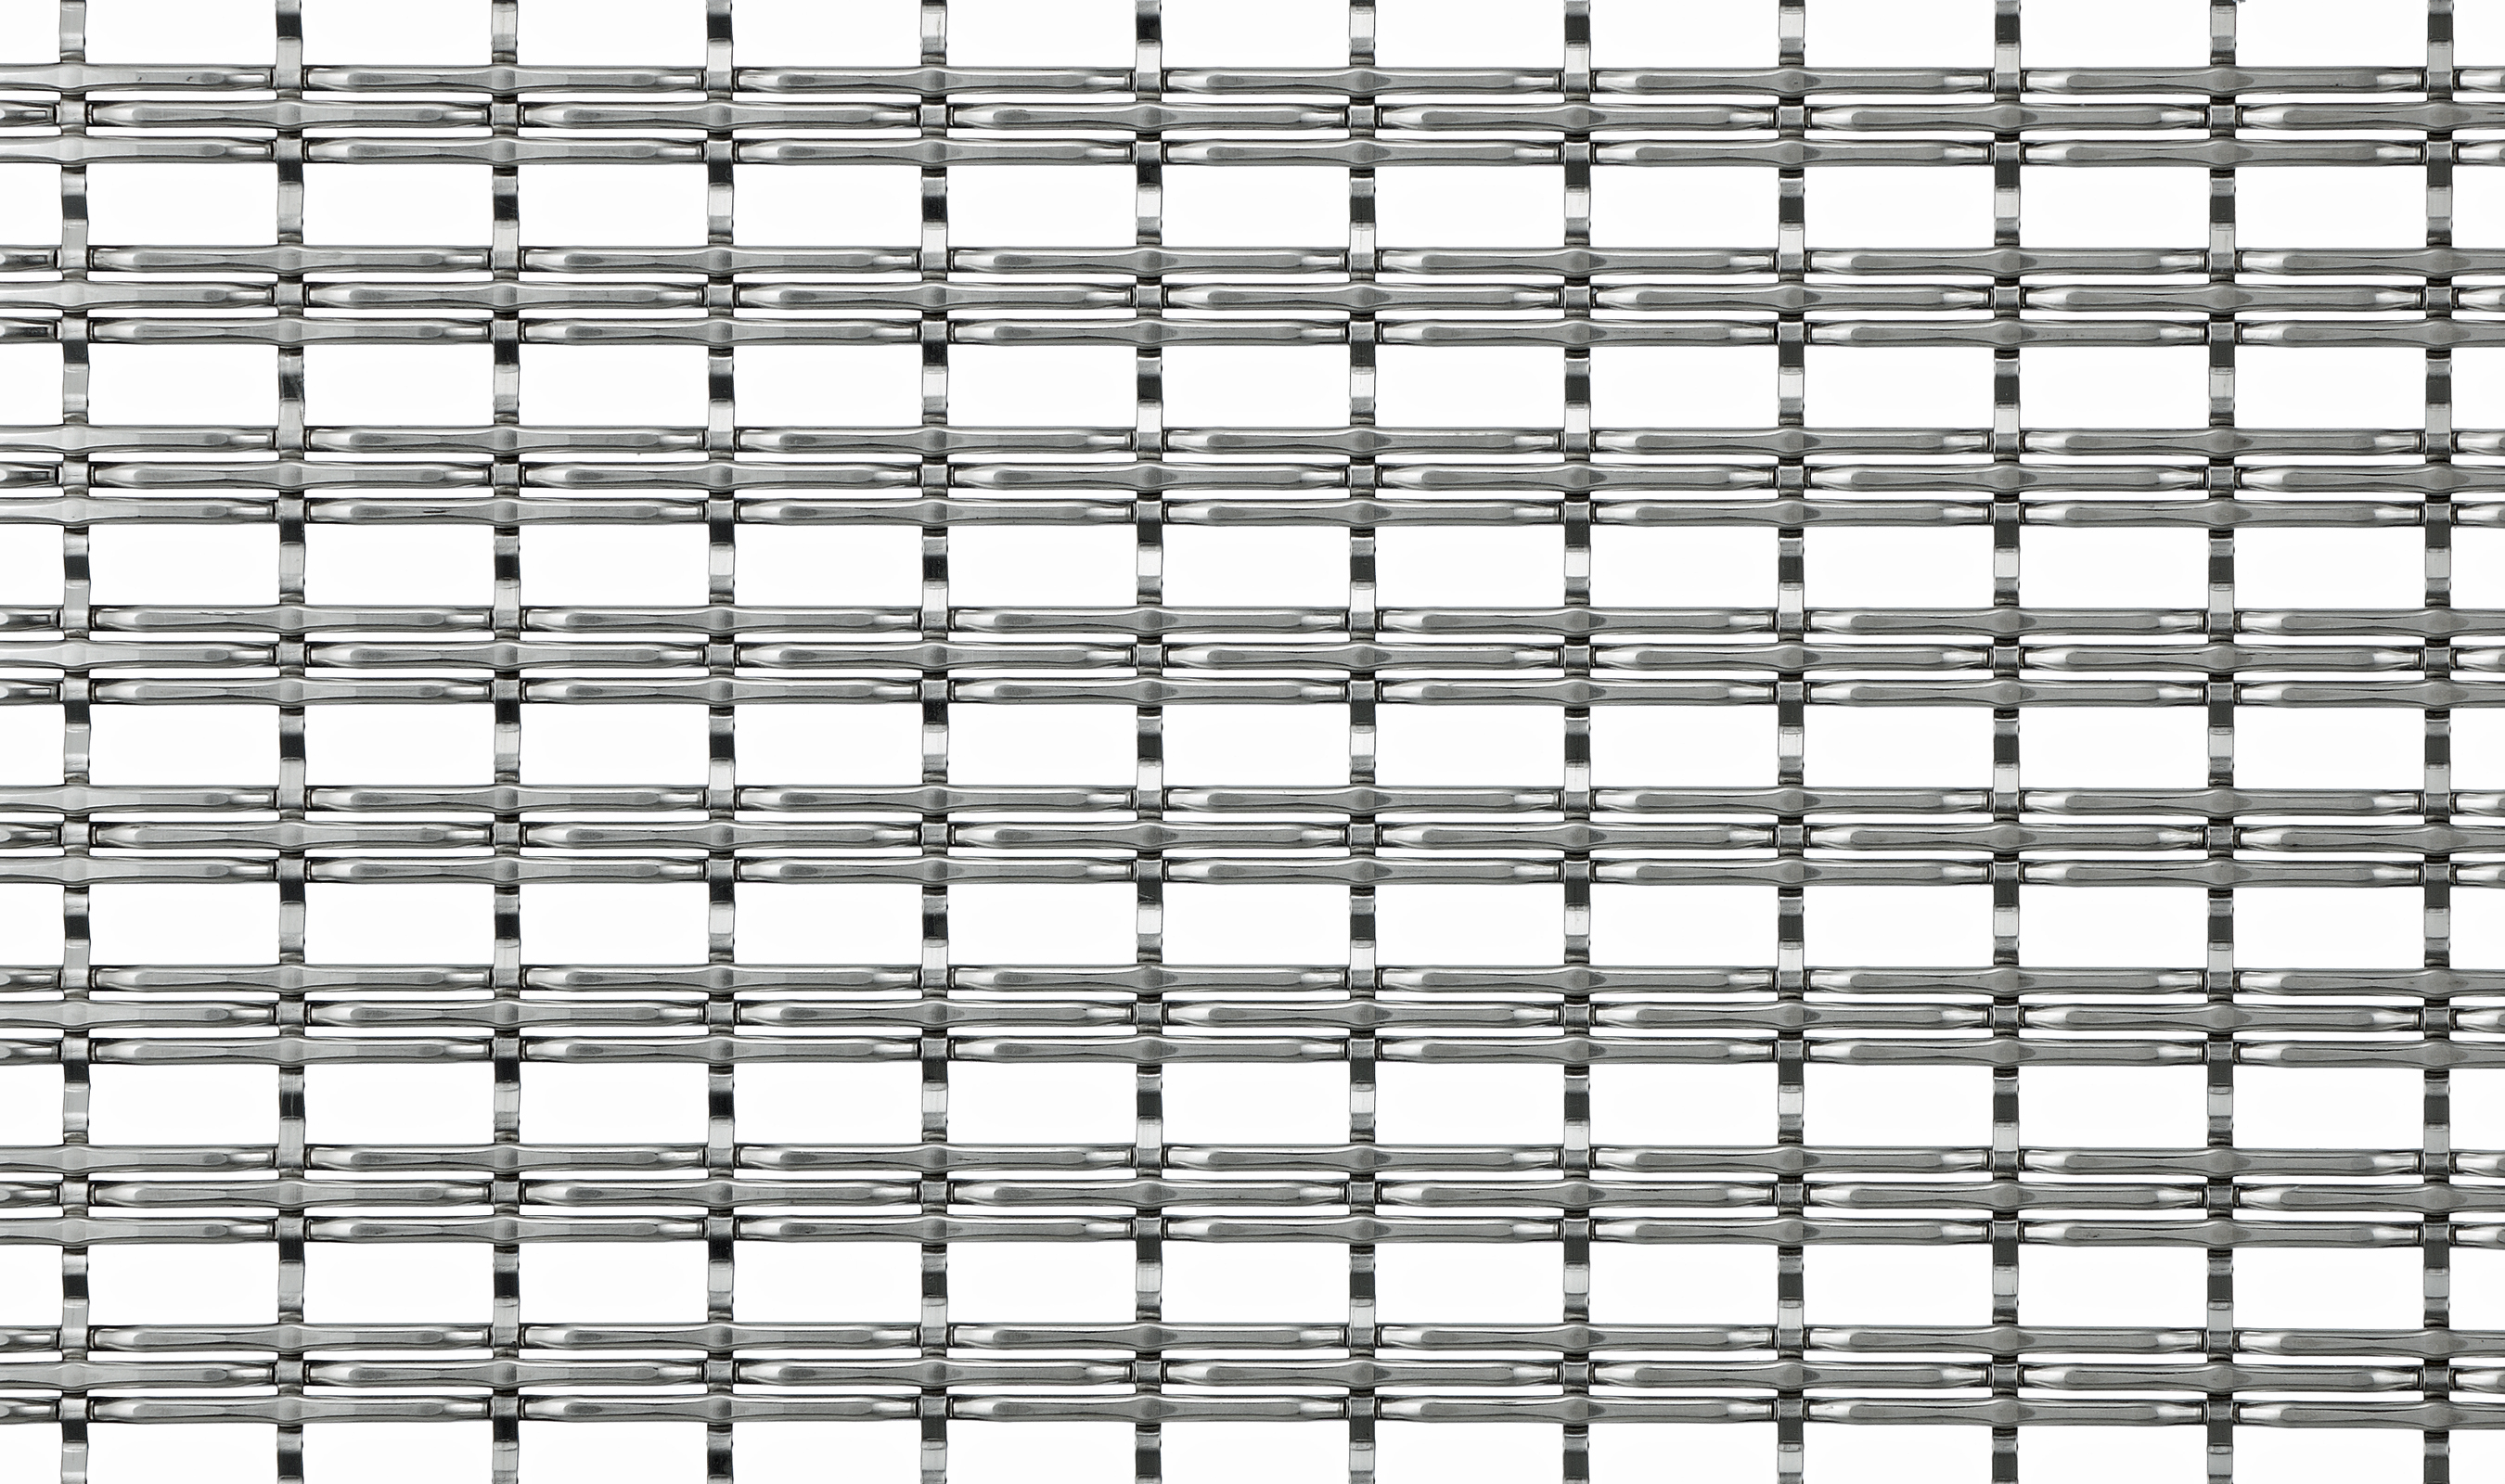 M31Z-3 Woven Wire Mesh Pattern